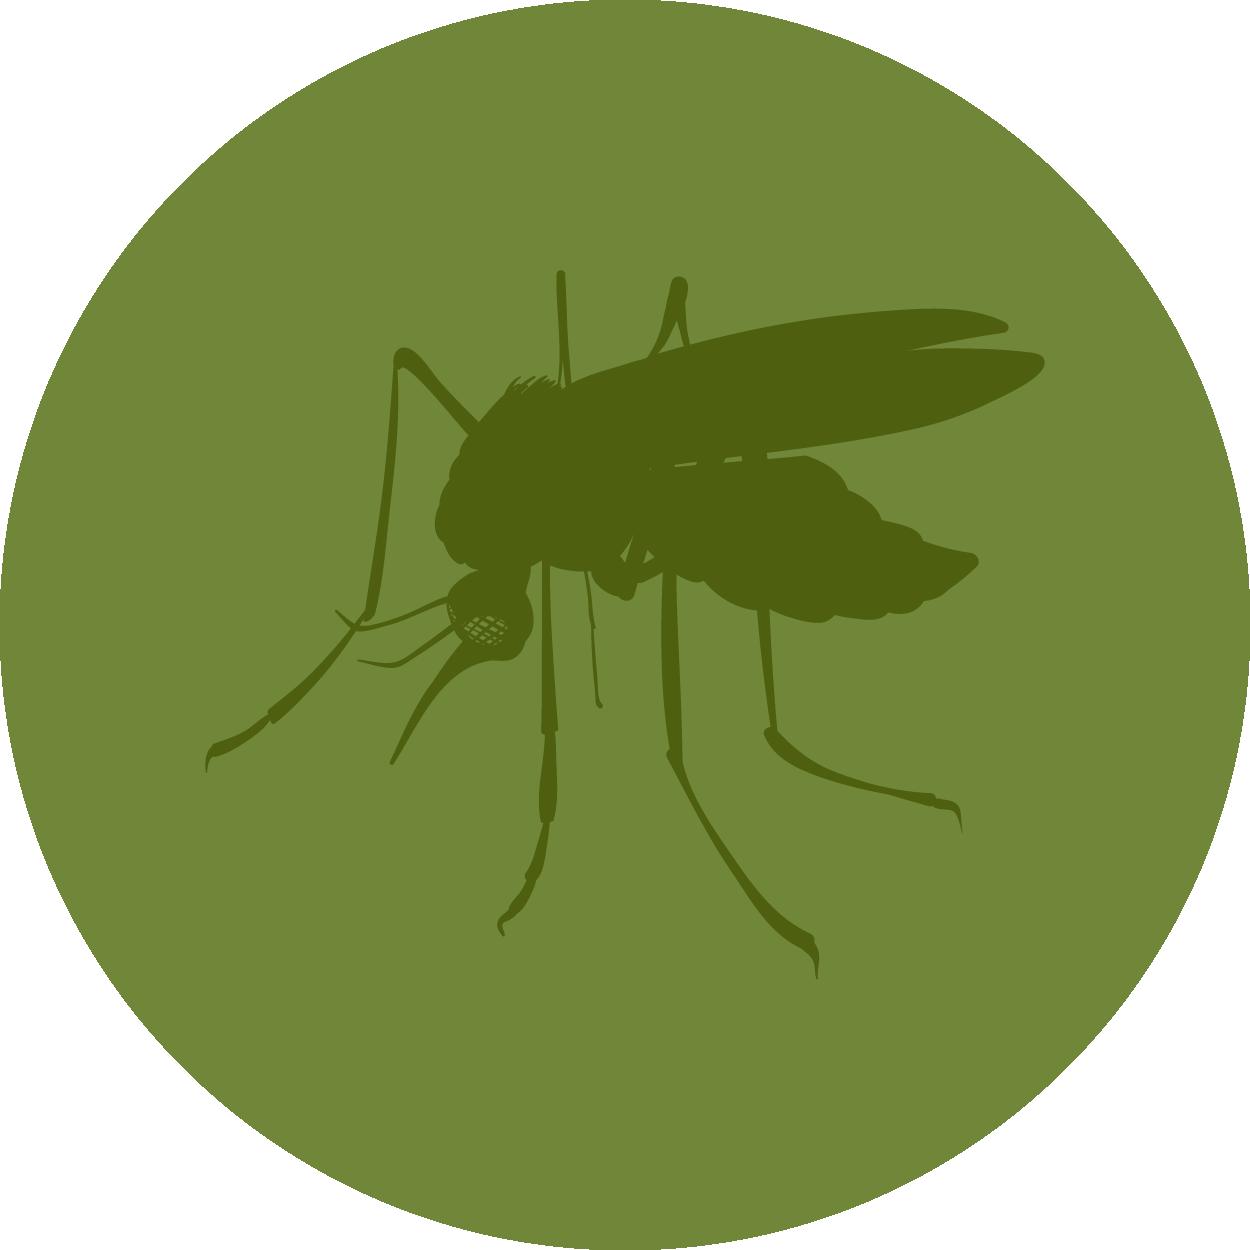 Mosquito clipart mosquito breeding. Control atlanta breda pest